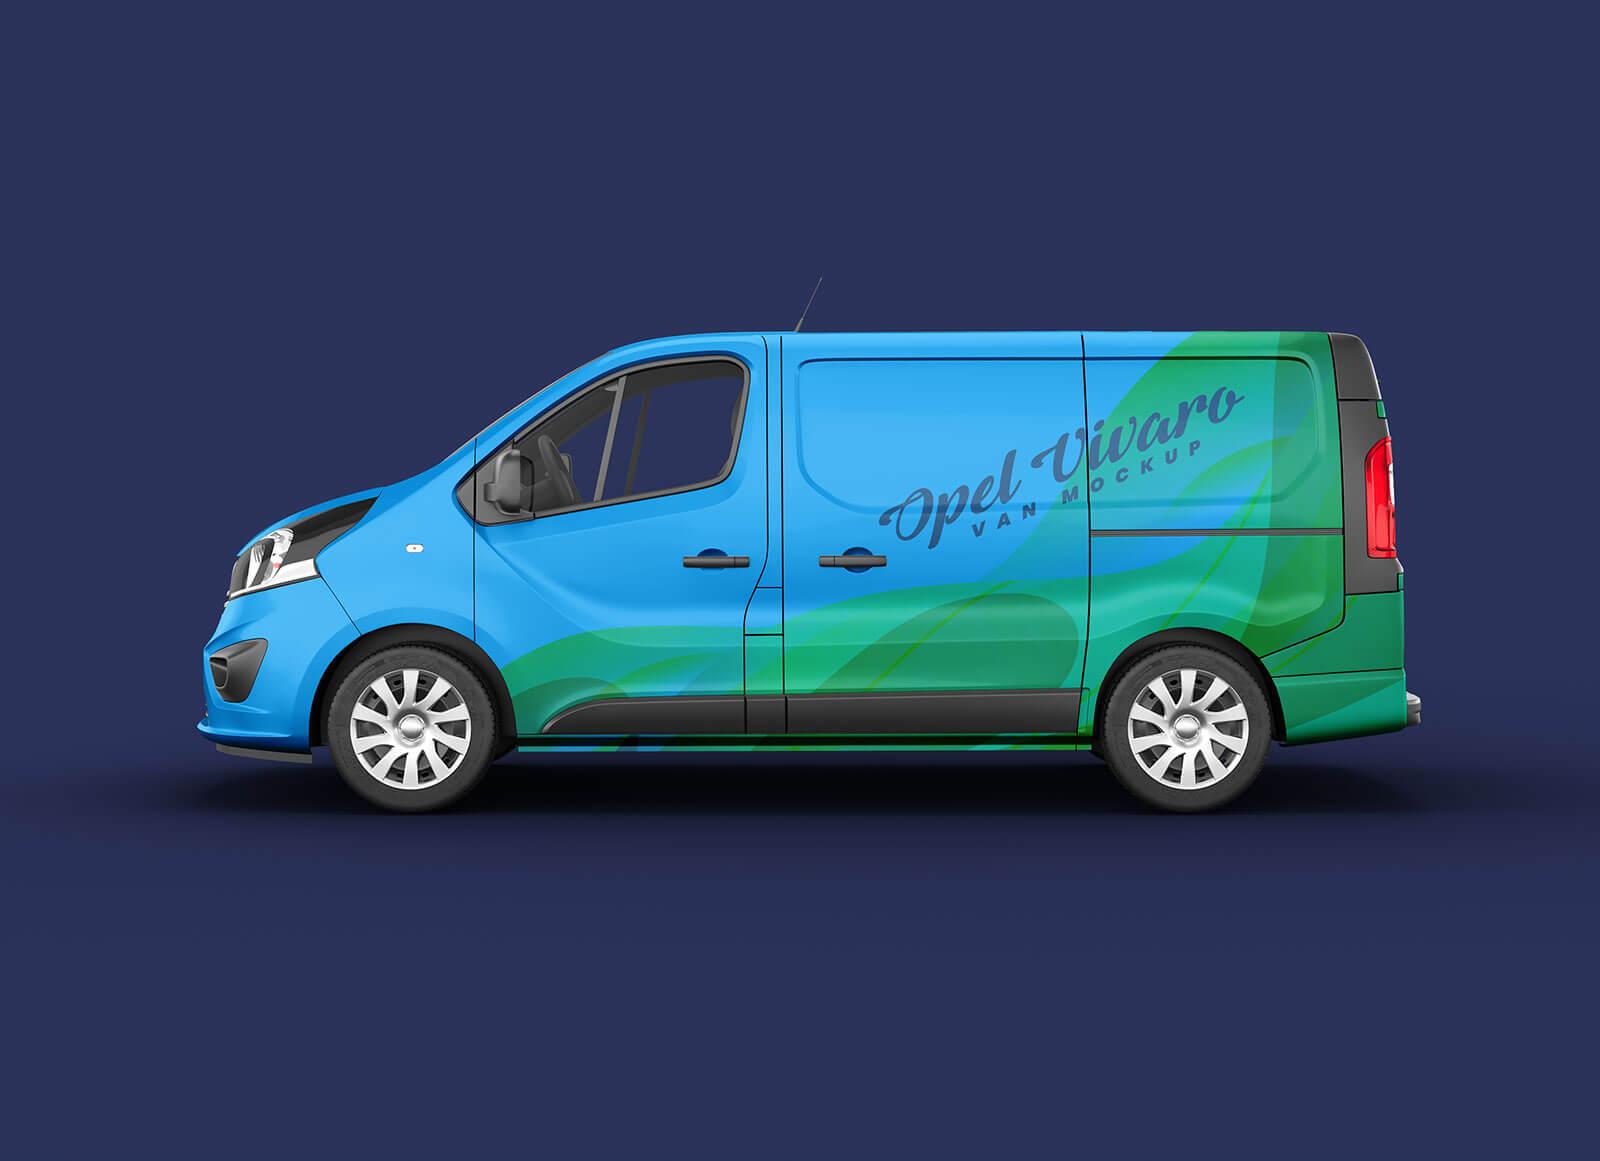 Free-Opel-Vivaro-Panel-Caddy-Van-Mockup-PSD-File